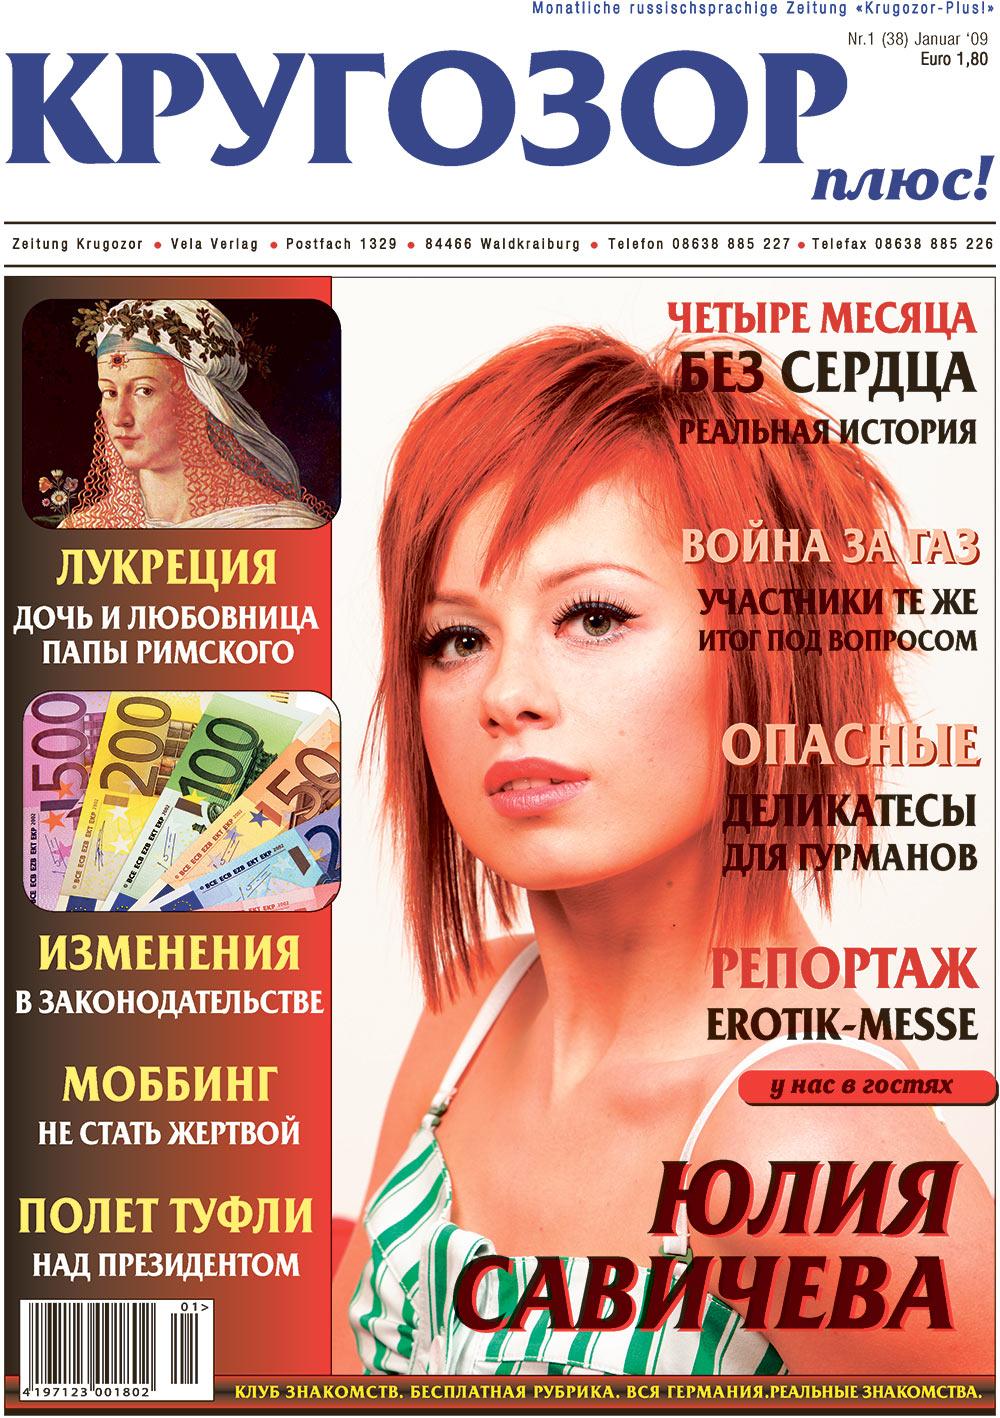 Кругозор плюс! (газета). 2009 год, номер 1, стр. 1